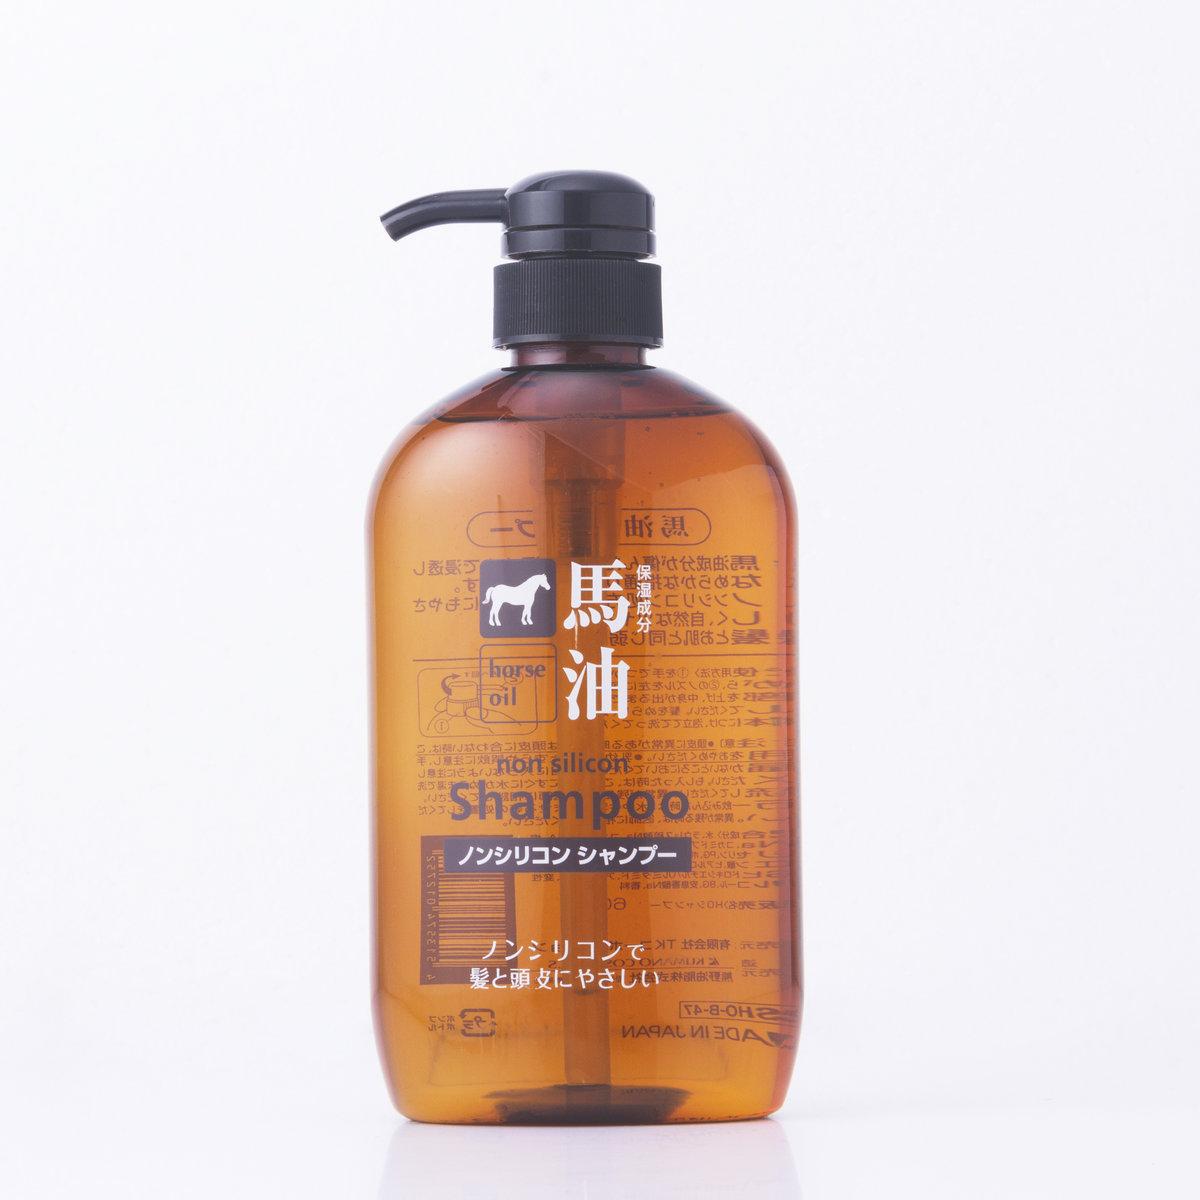 Horse Oil Non-Silicon Shampoo 600ml